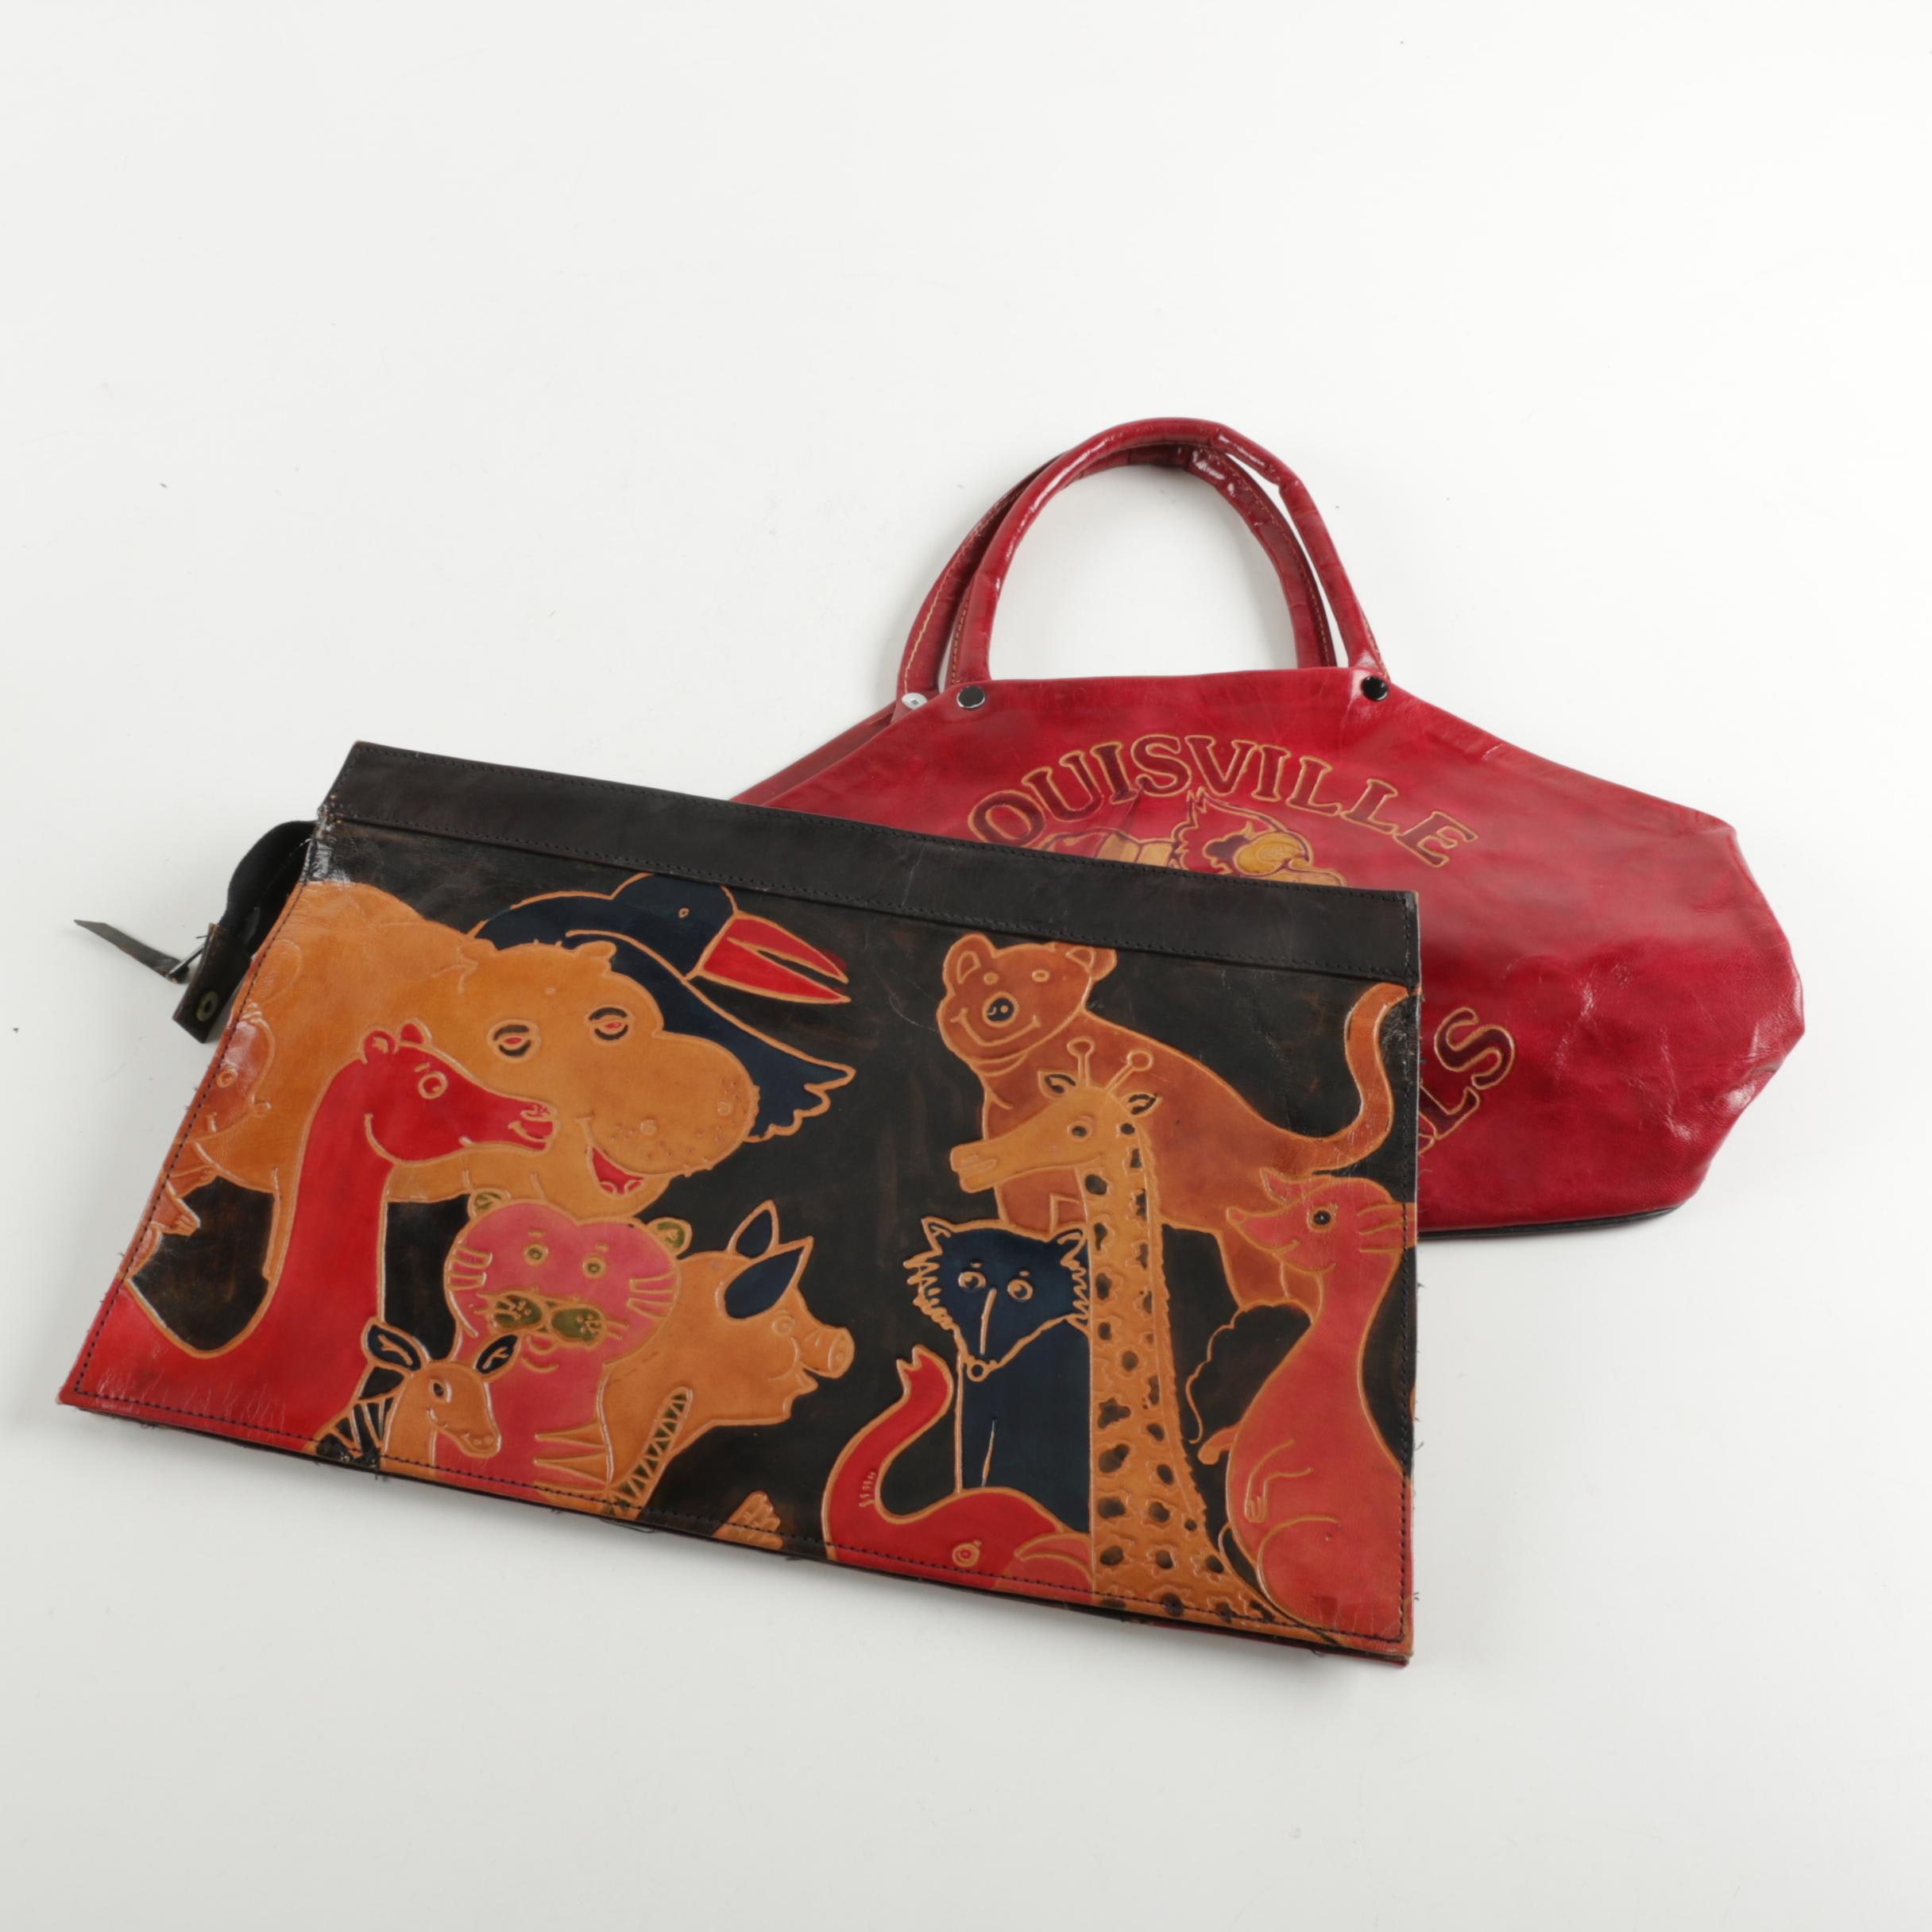 Hand-Tooled Leather Handbags Including Louisville Cardinals Handbag